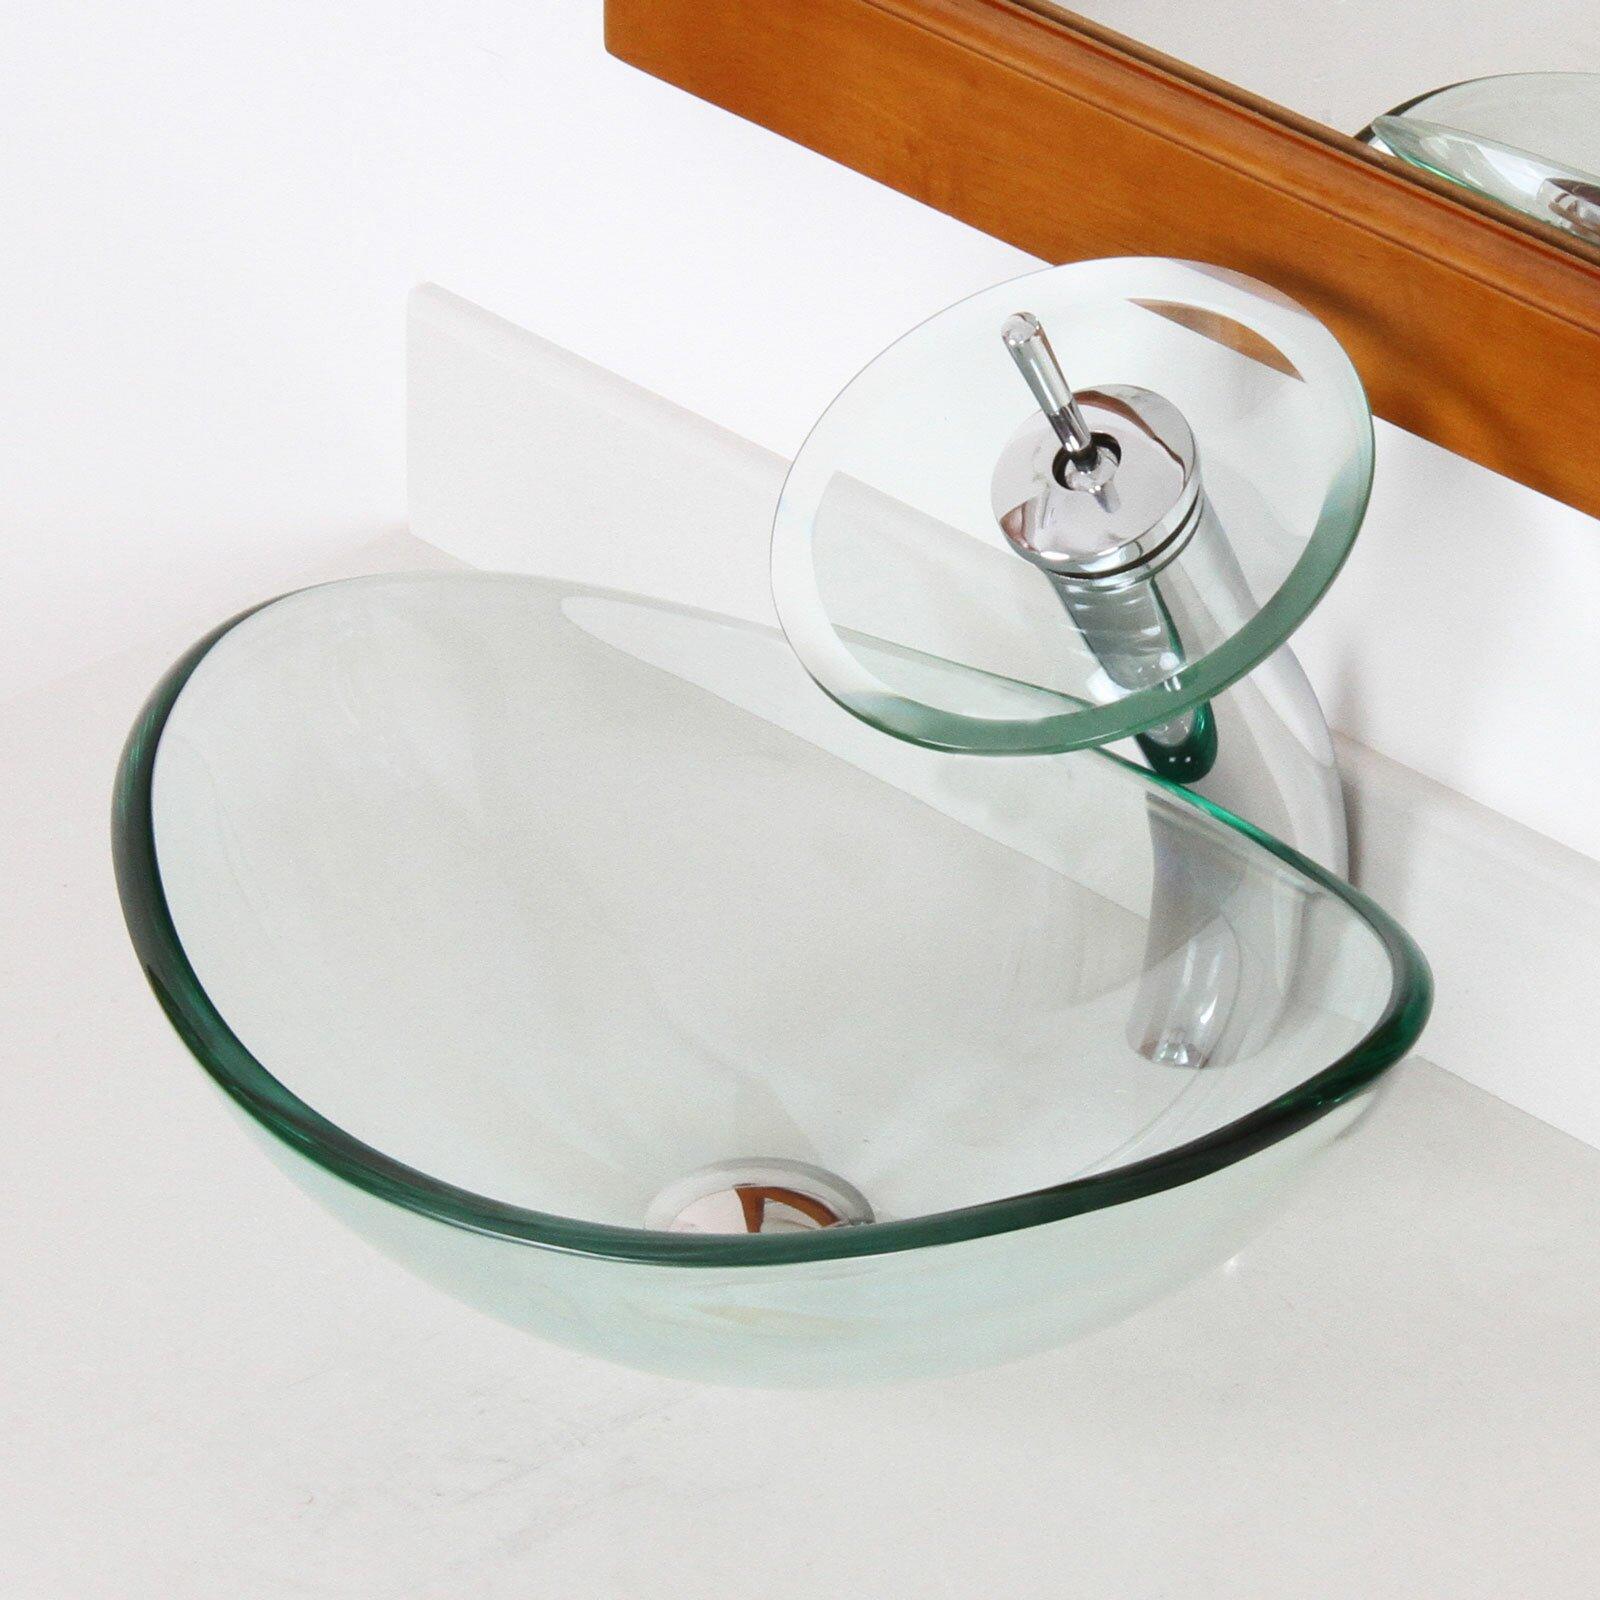 Elite mini tempered glass boat shaped oval bowl bottom - Bathroom tempered glass vessel sink ...